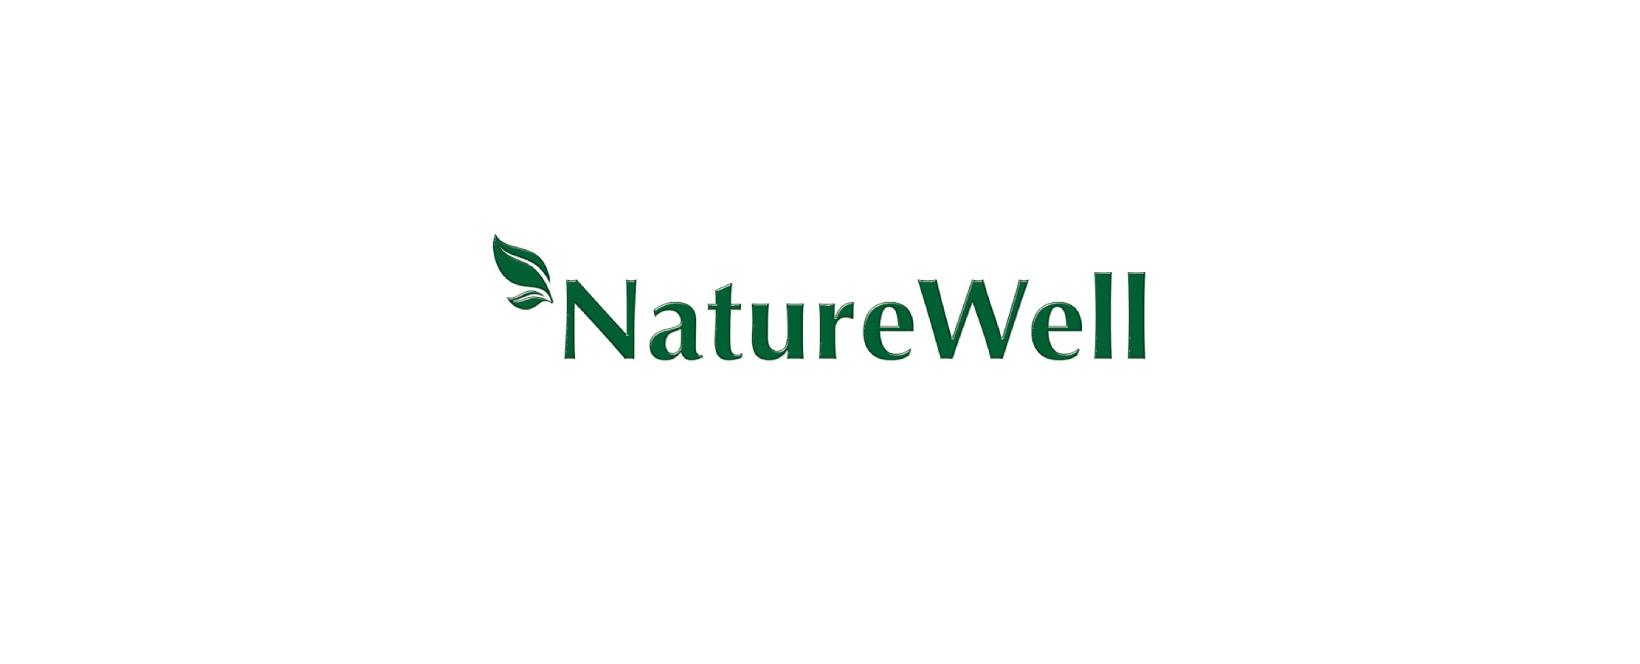 naturewell Discount Code 2021